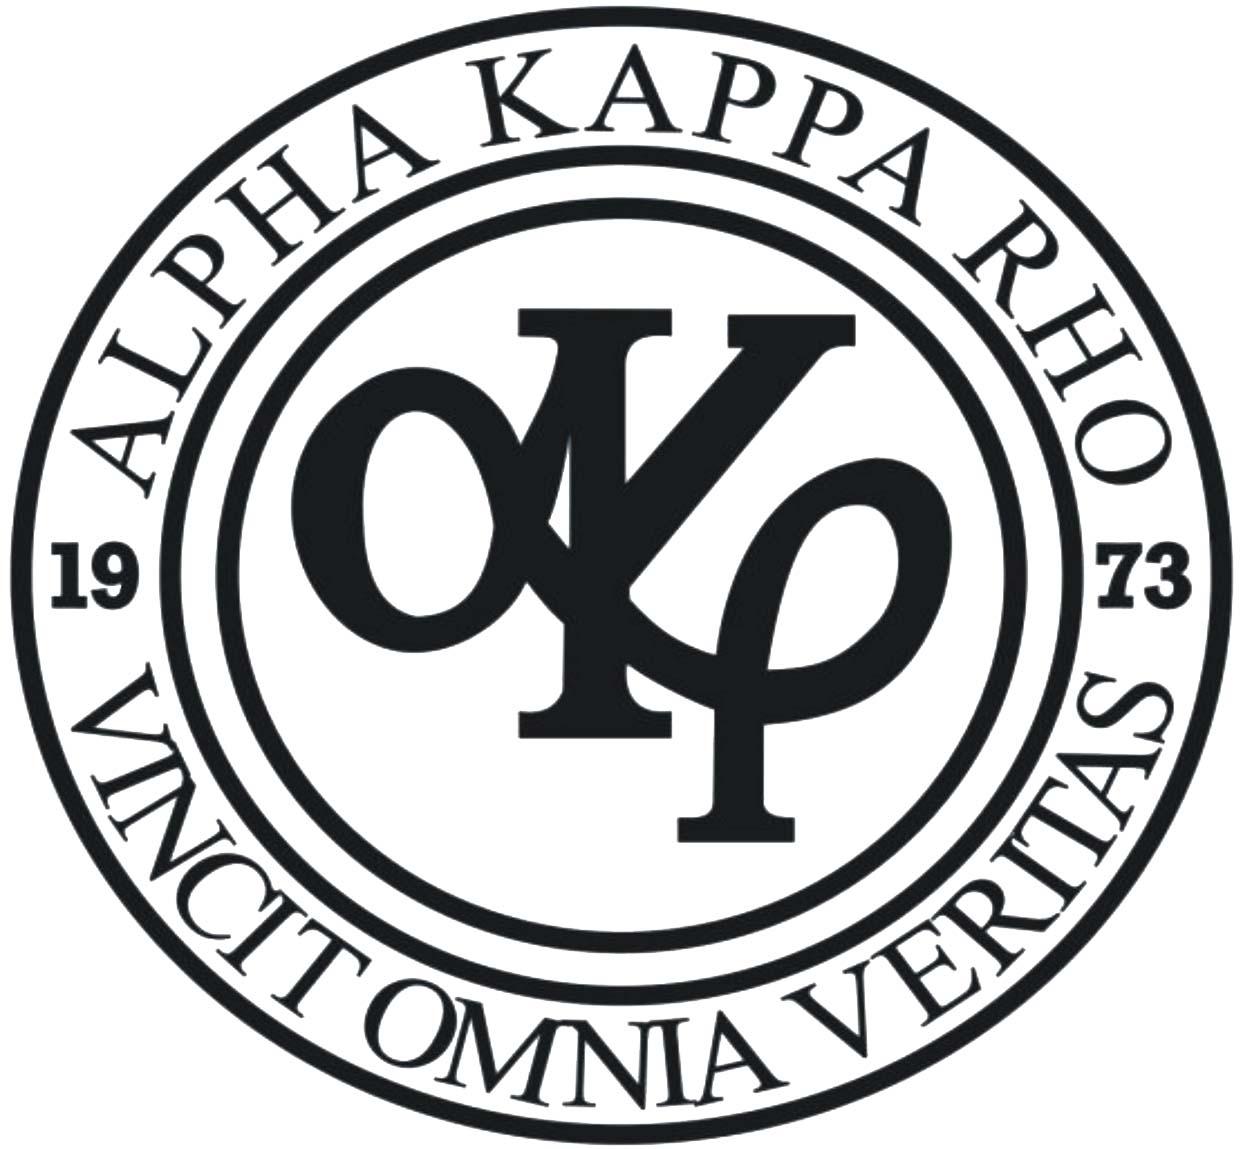 Alpha Kappa Rho - Wikipedia